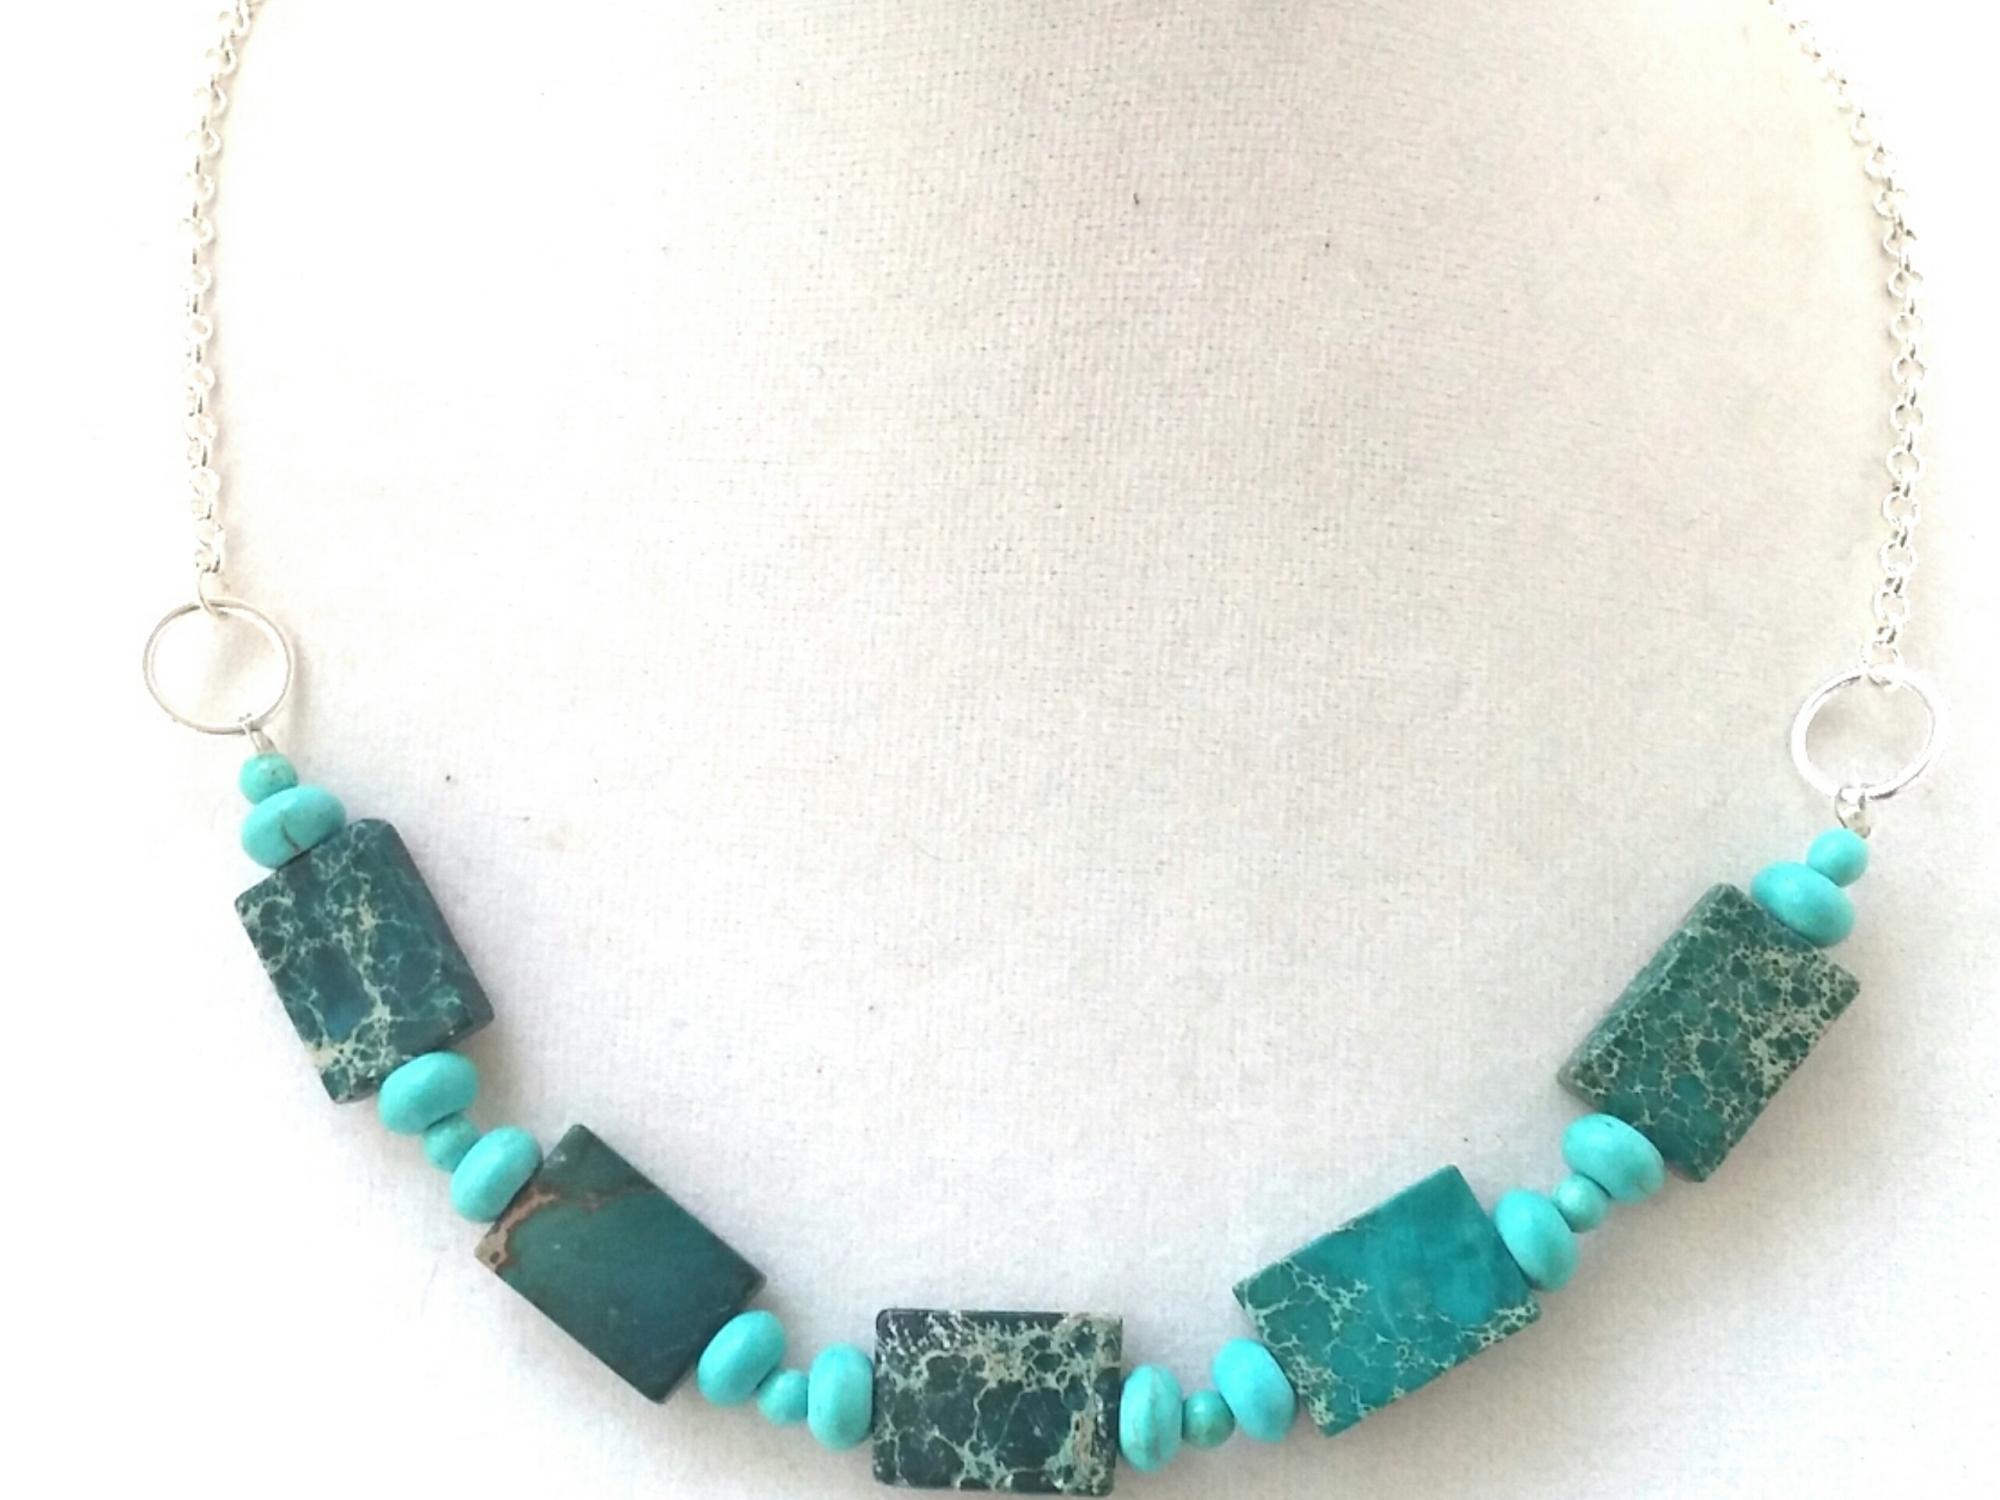 Mermaid Jewelry, Mermaid Necklace, Statement Necklace, Blue Statement Necklace, Unique Blue Jewelry